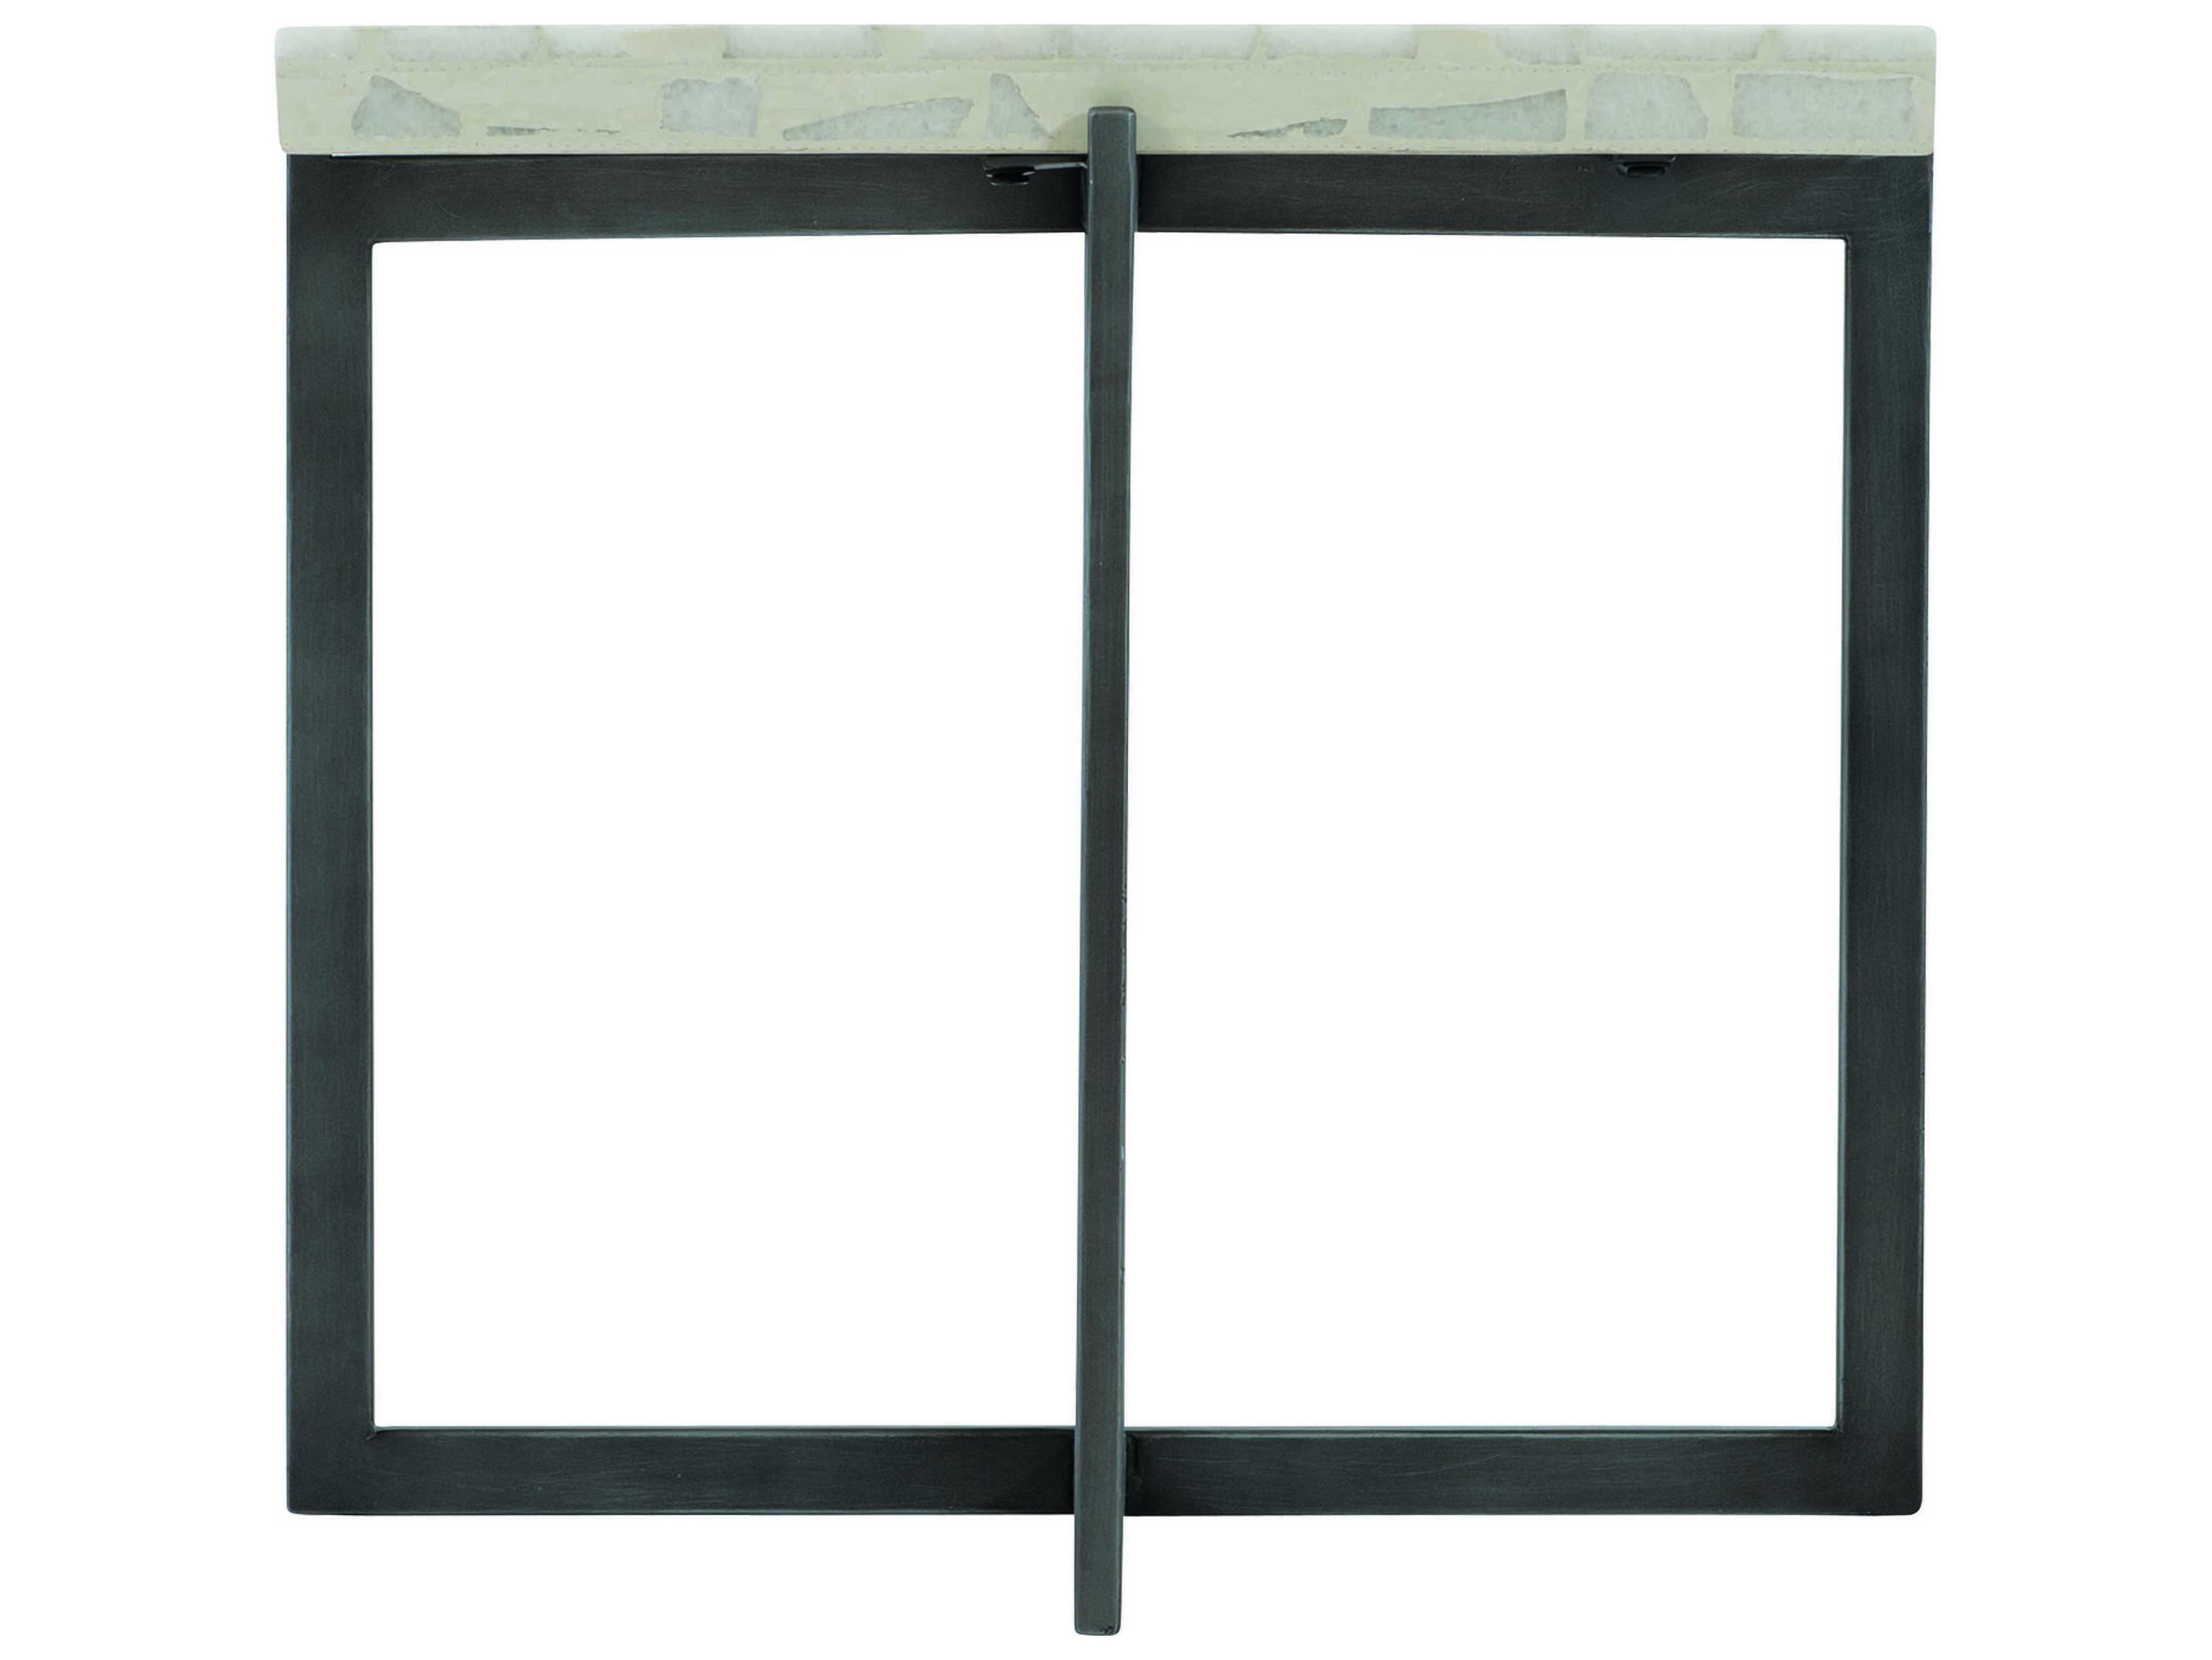 Bernhardt Exteriors Flint Gray Terrazzo 22 Wide Square Faux Stone Steel Stillwater End Table Bhex01009